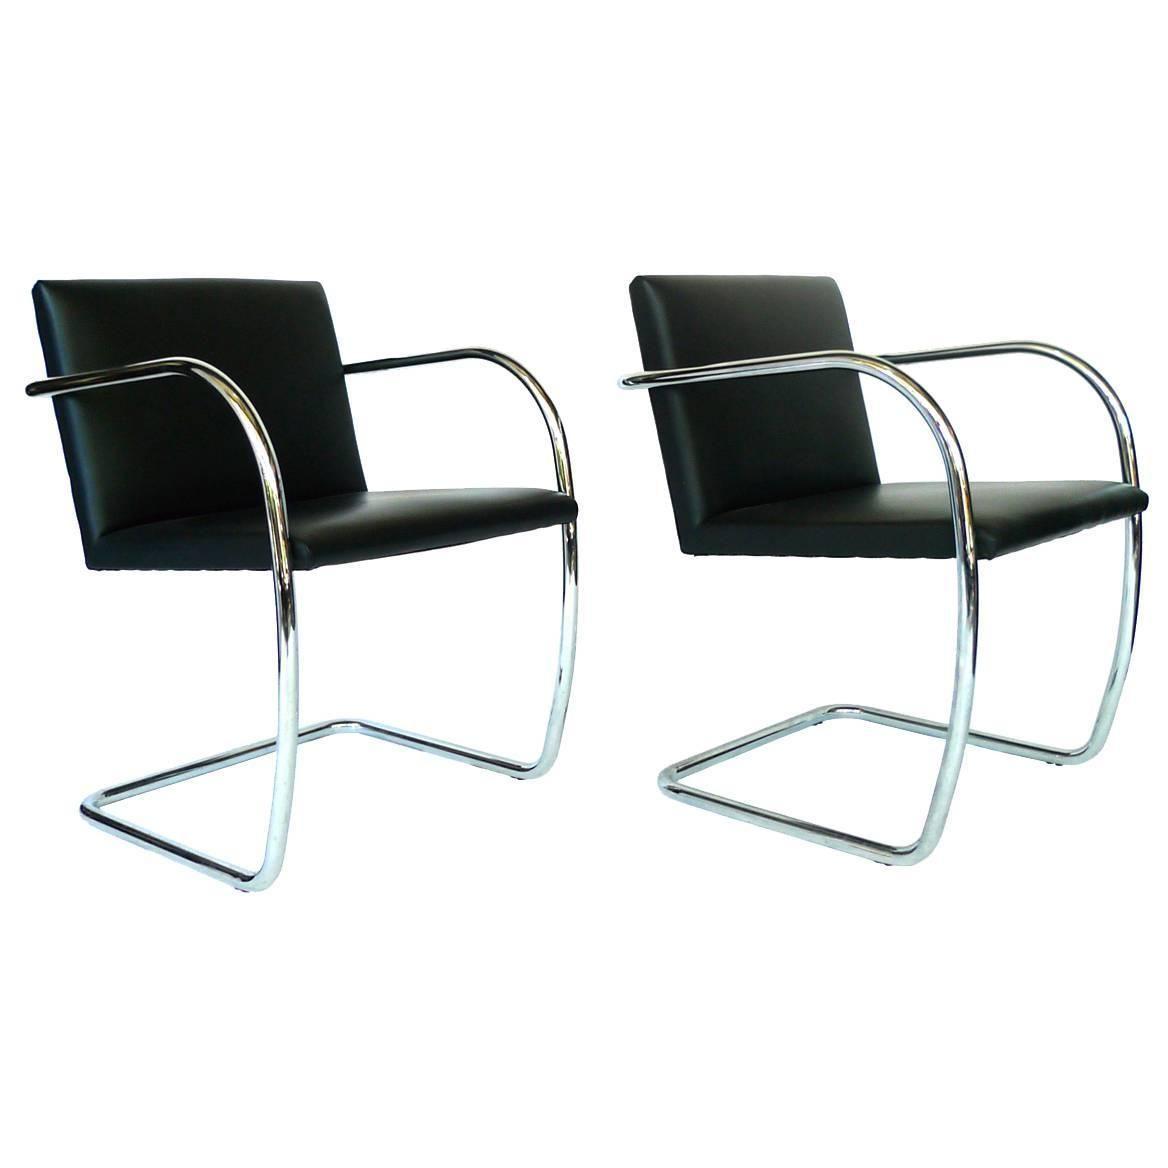 Chaise Brno Mies Van Der Rohe pair of mies van der rohe brno chairs | mies van der rohe